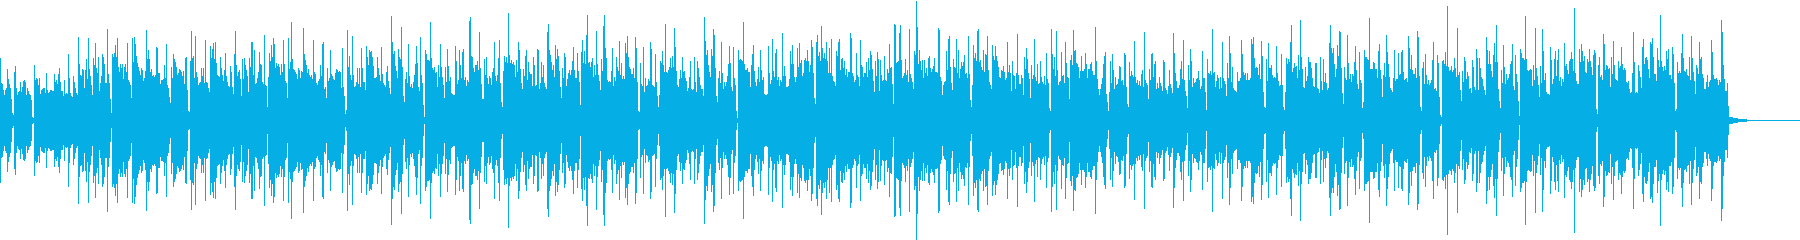 BassとGtのシックなR&B風の再生済みの波形